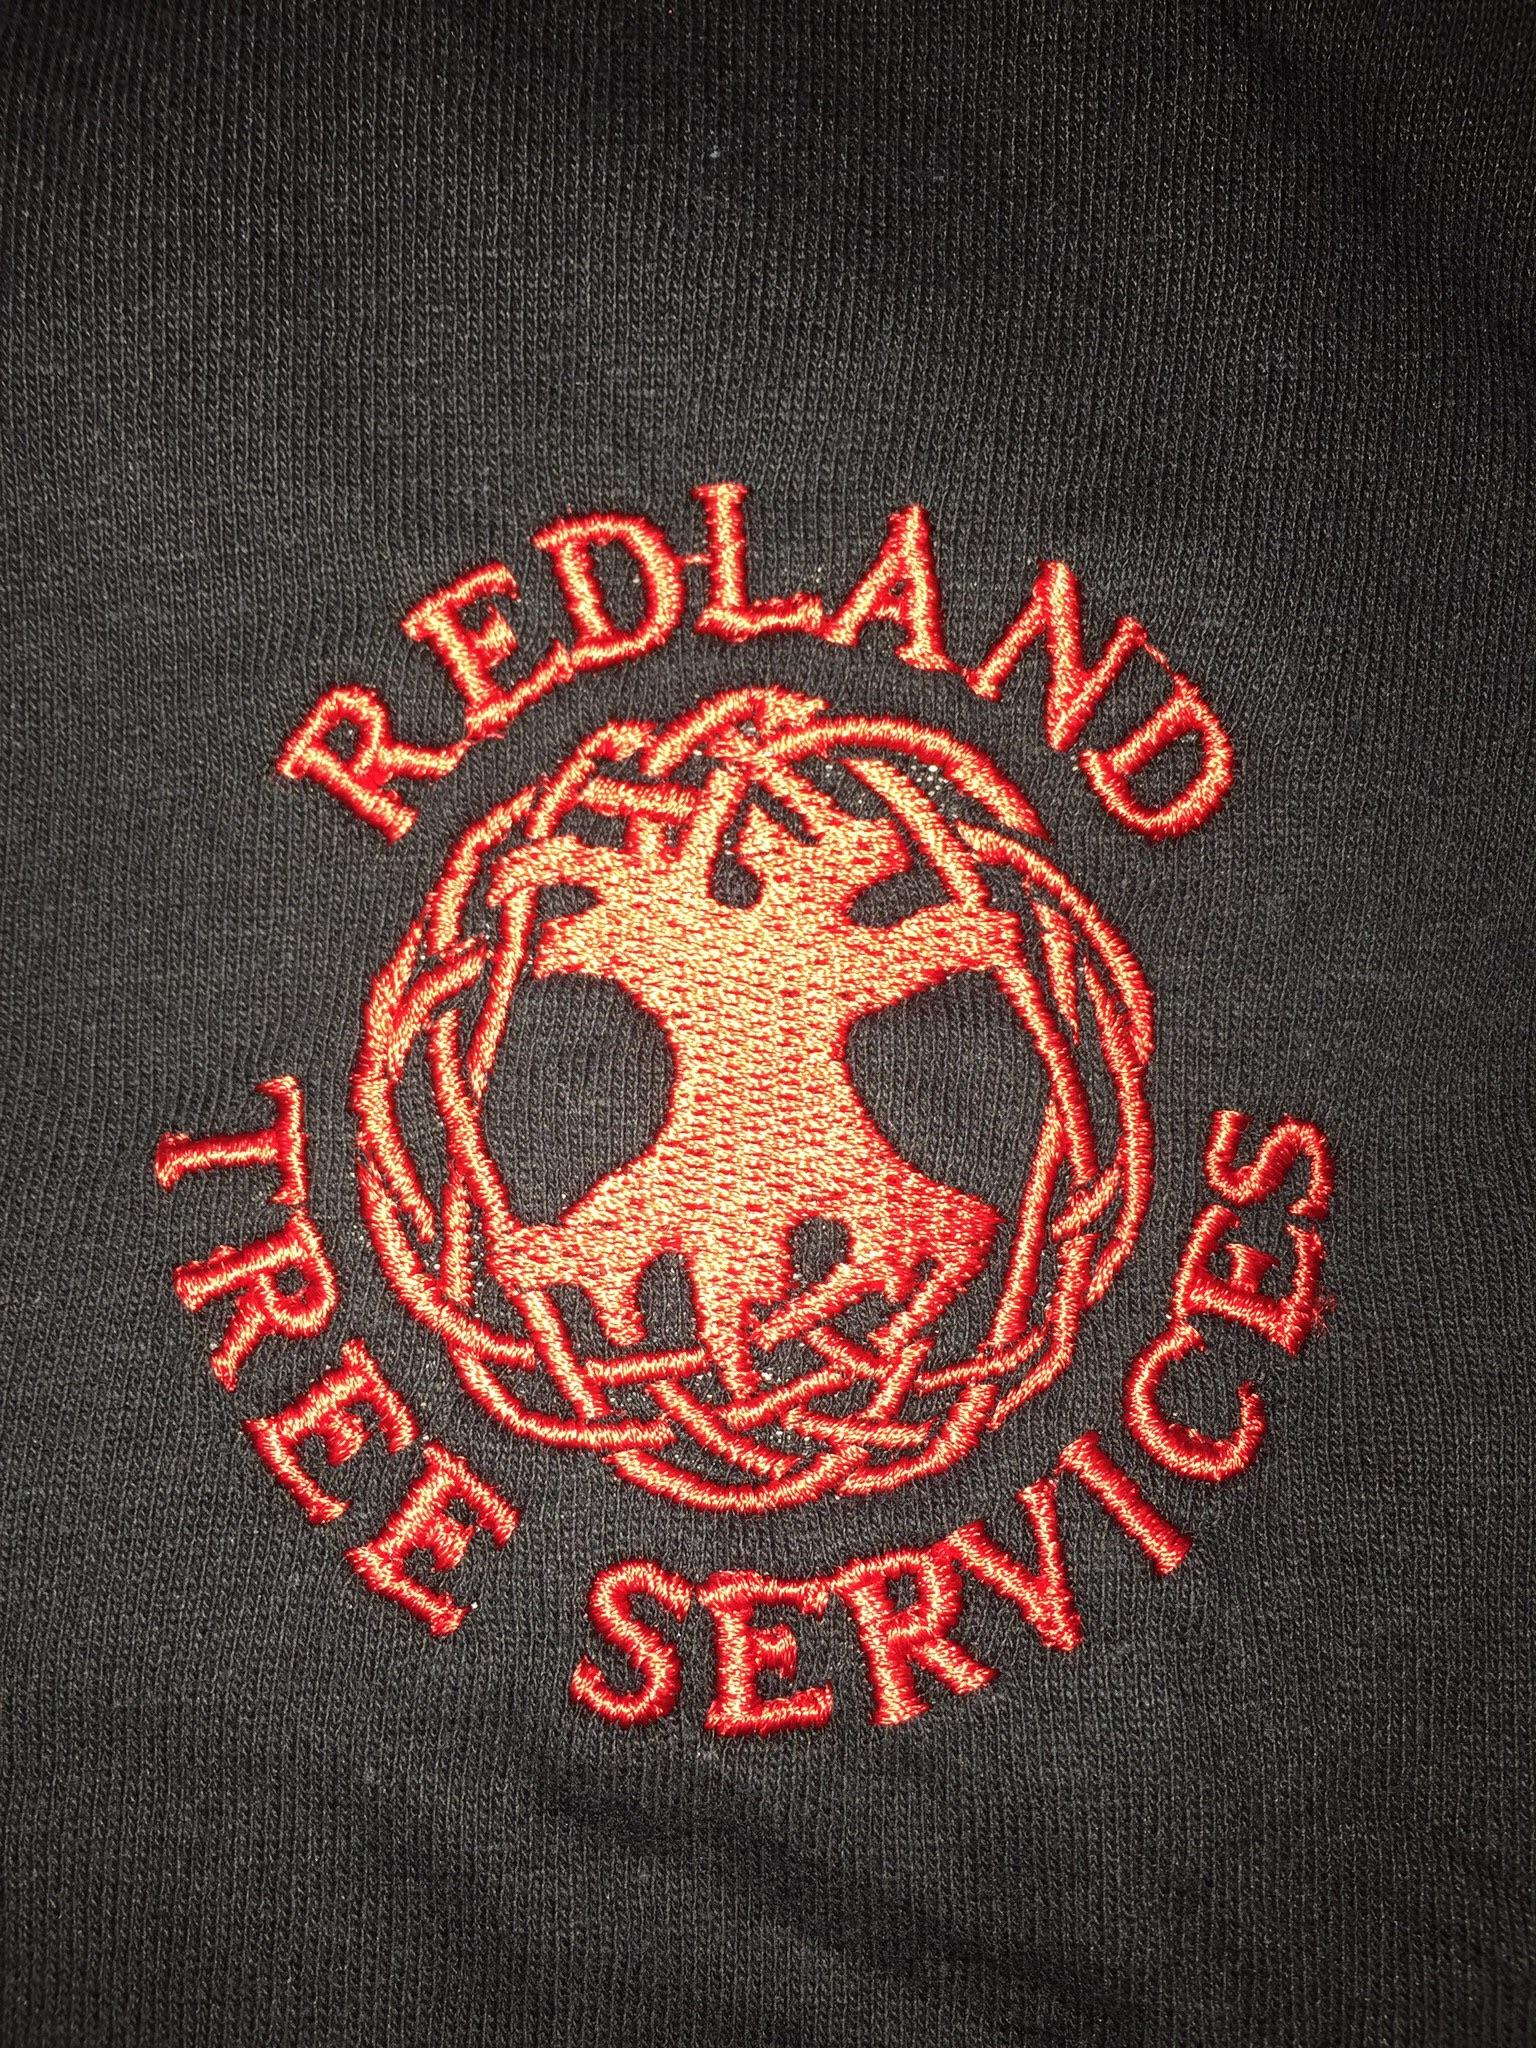 Main photo for Redland Tree Services